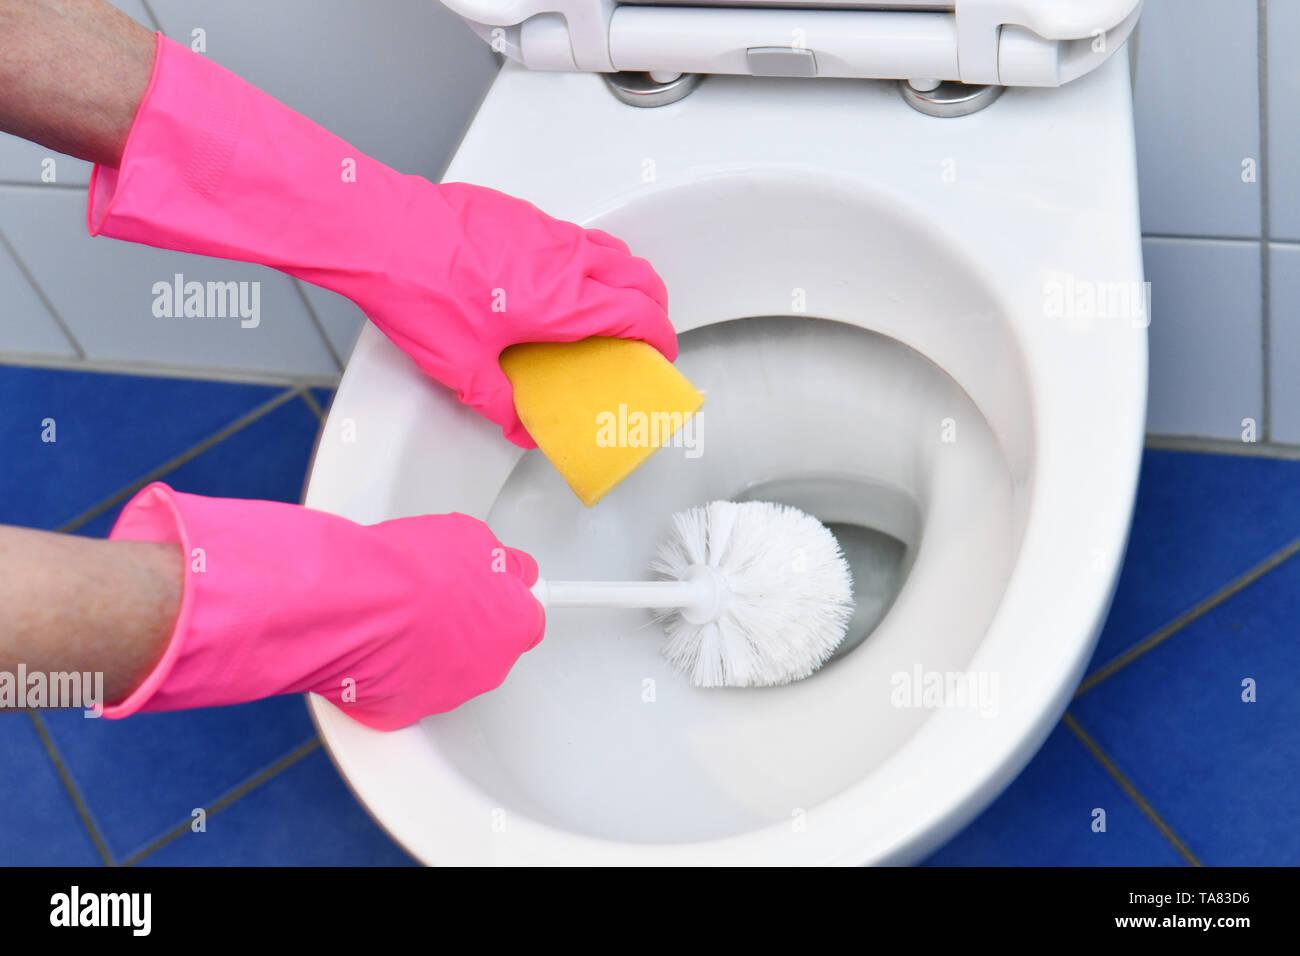 Cleaning, bathroom, toilet, Reinigung, Badezimmer, Toilette Stock Photo